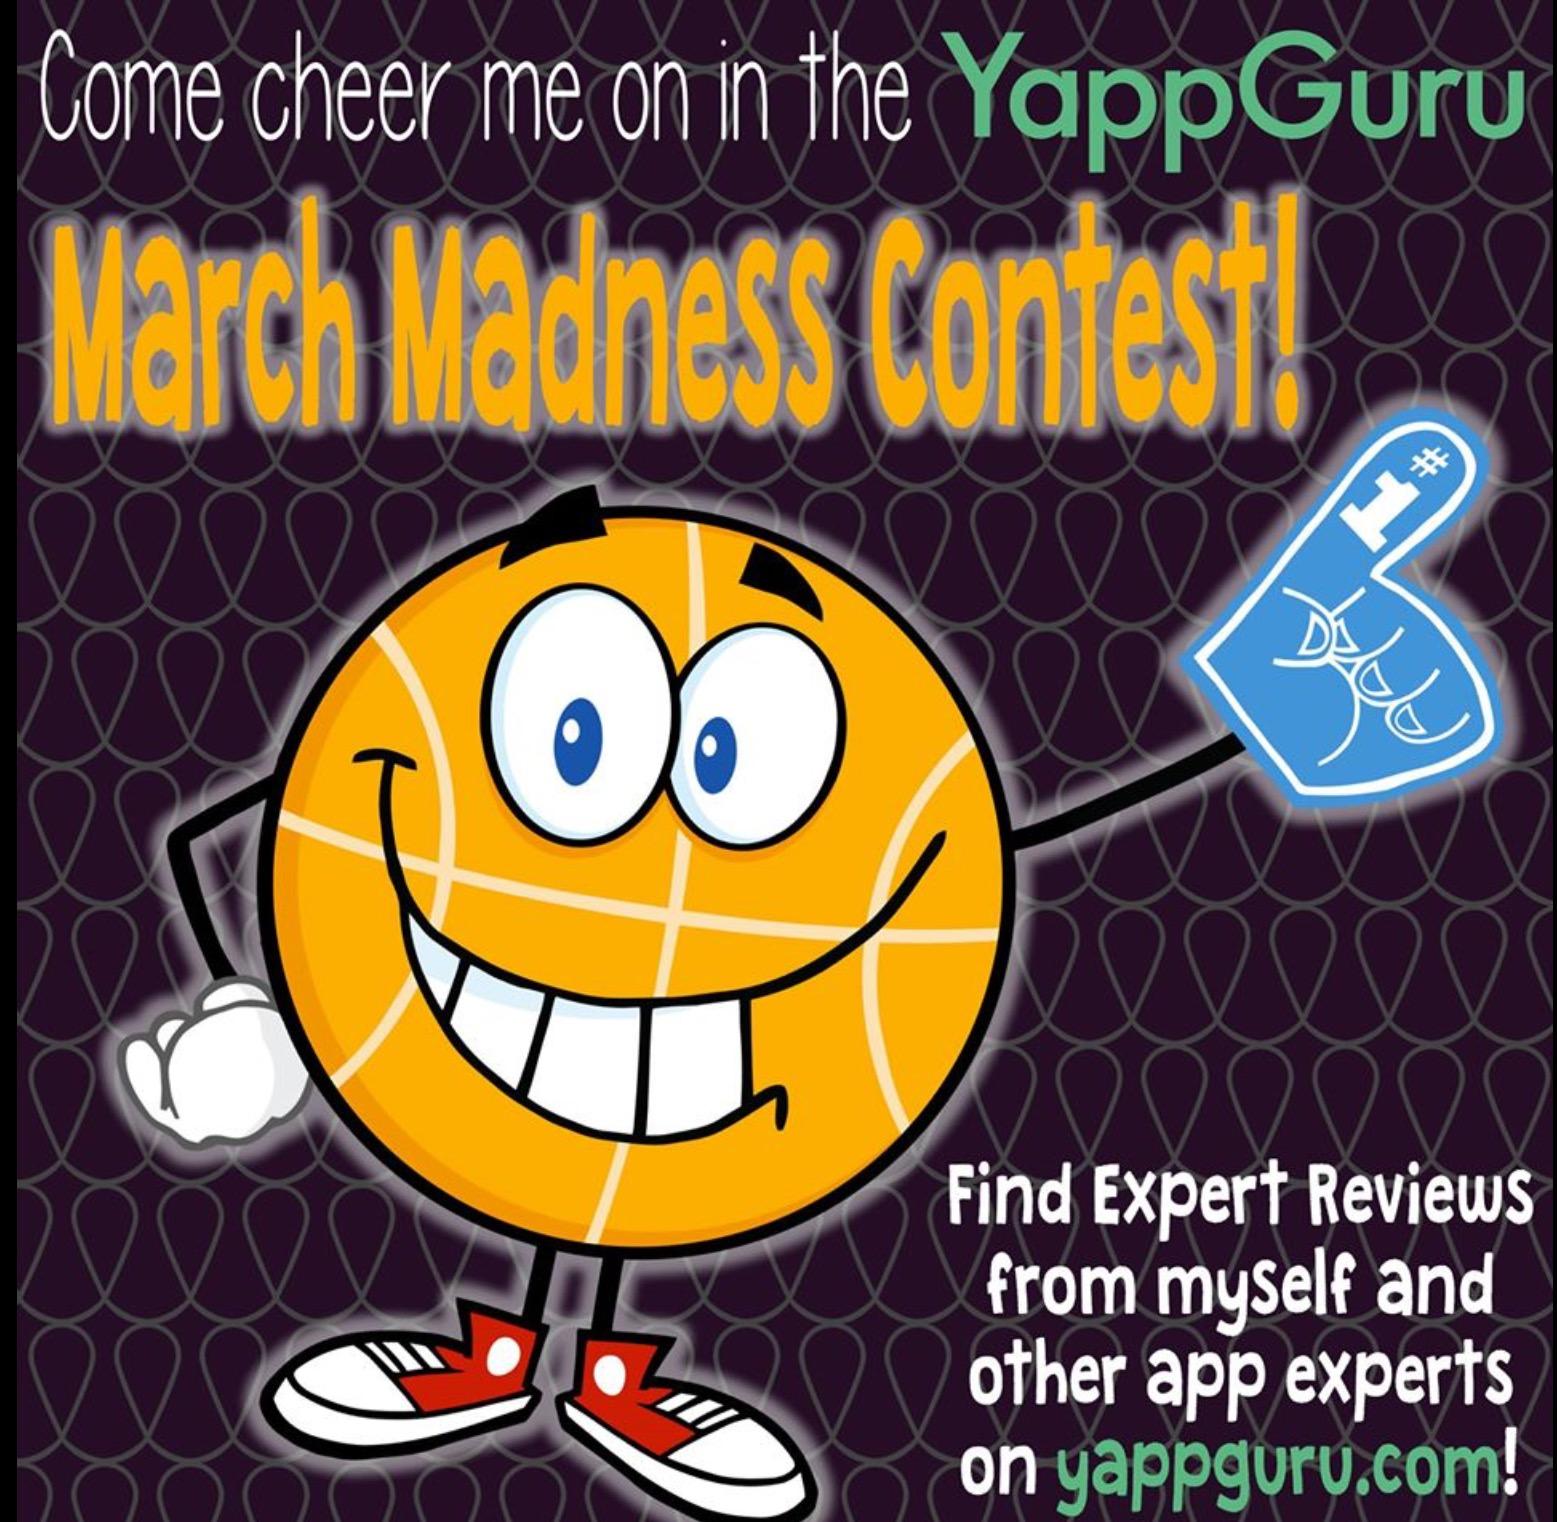 March on to YappGuru